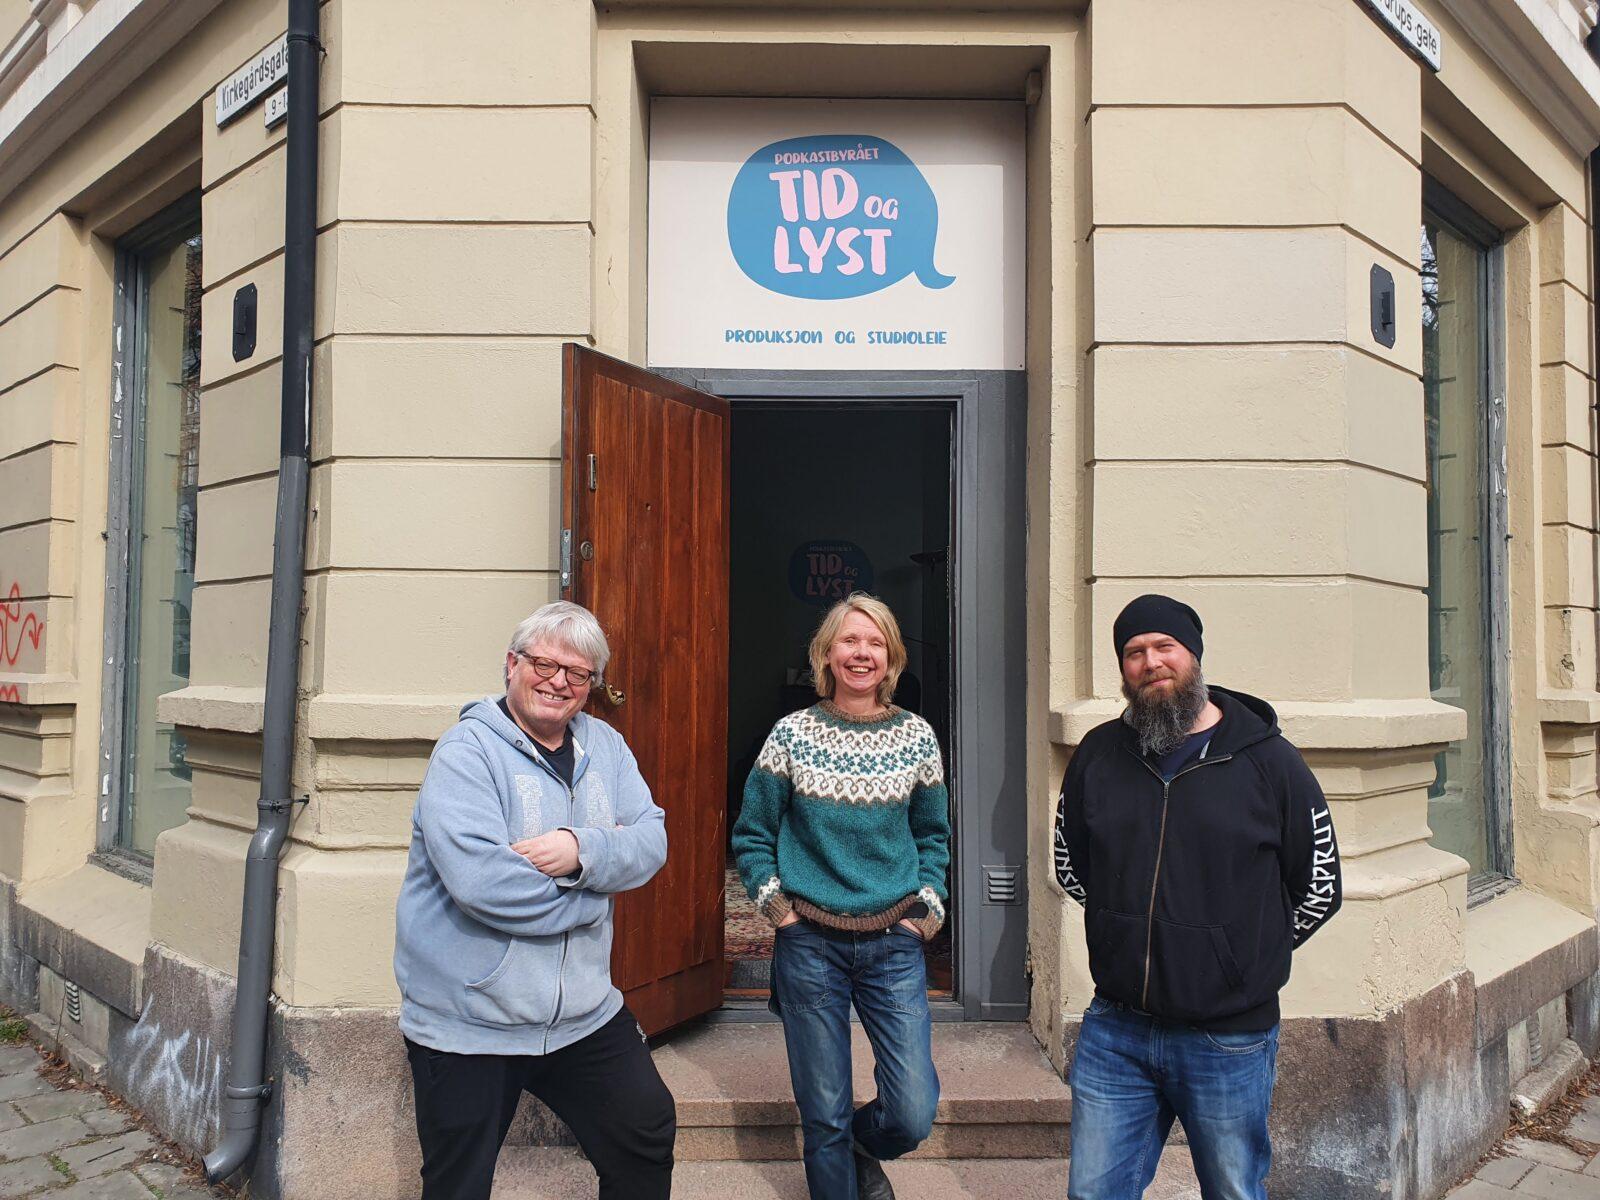 Eirik, Pia og Nils Johan foran inngangen til Tud og Lyst podkaststudio